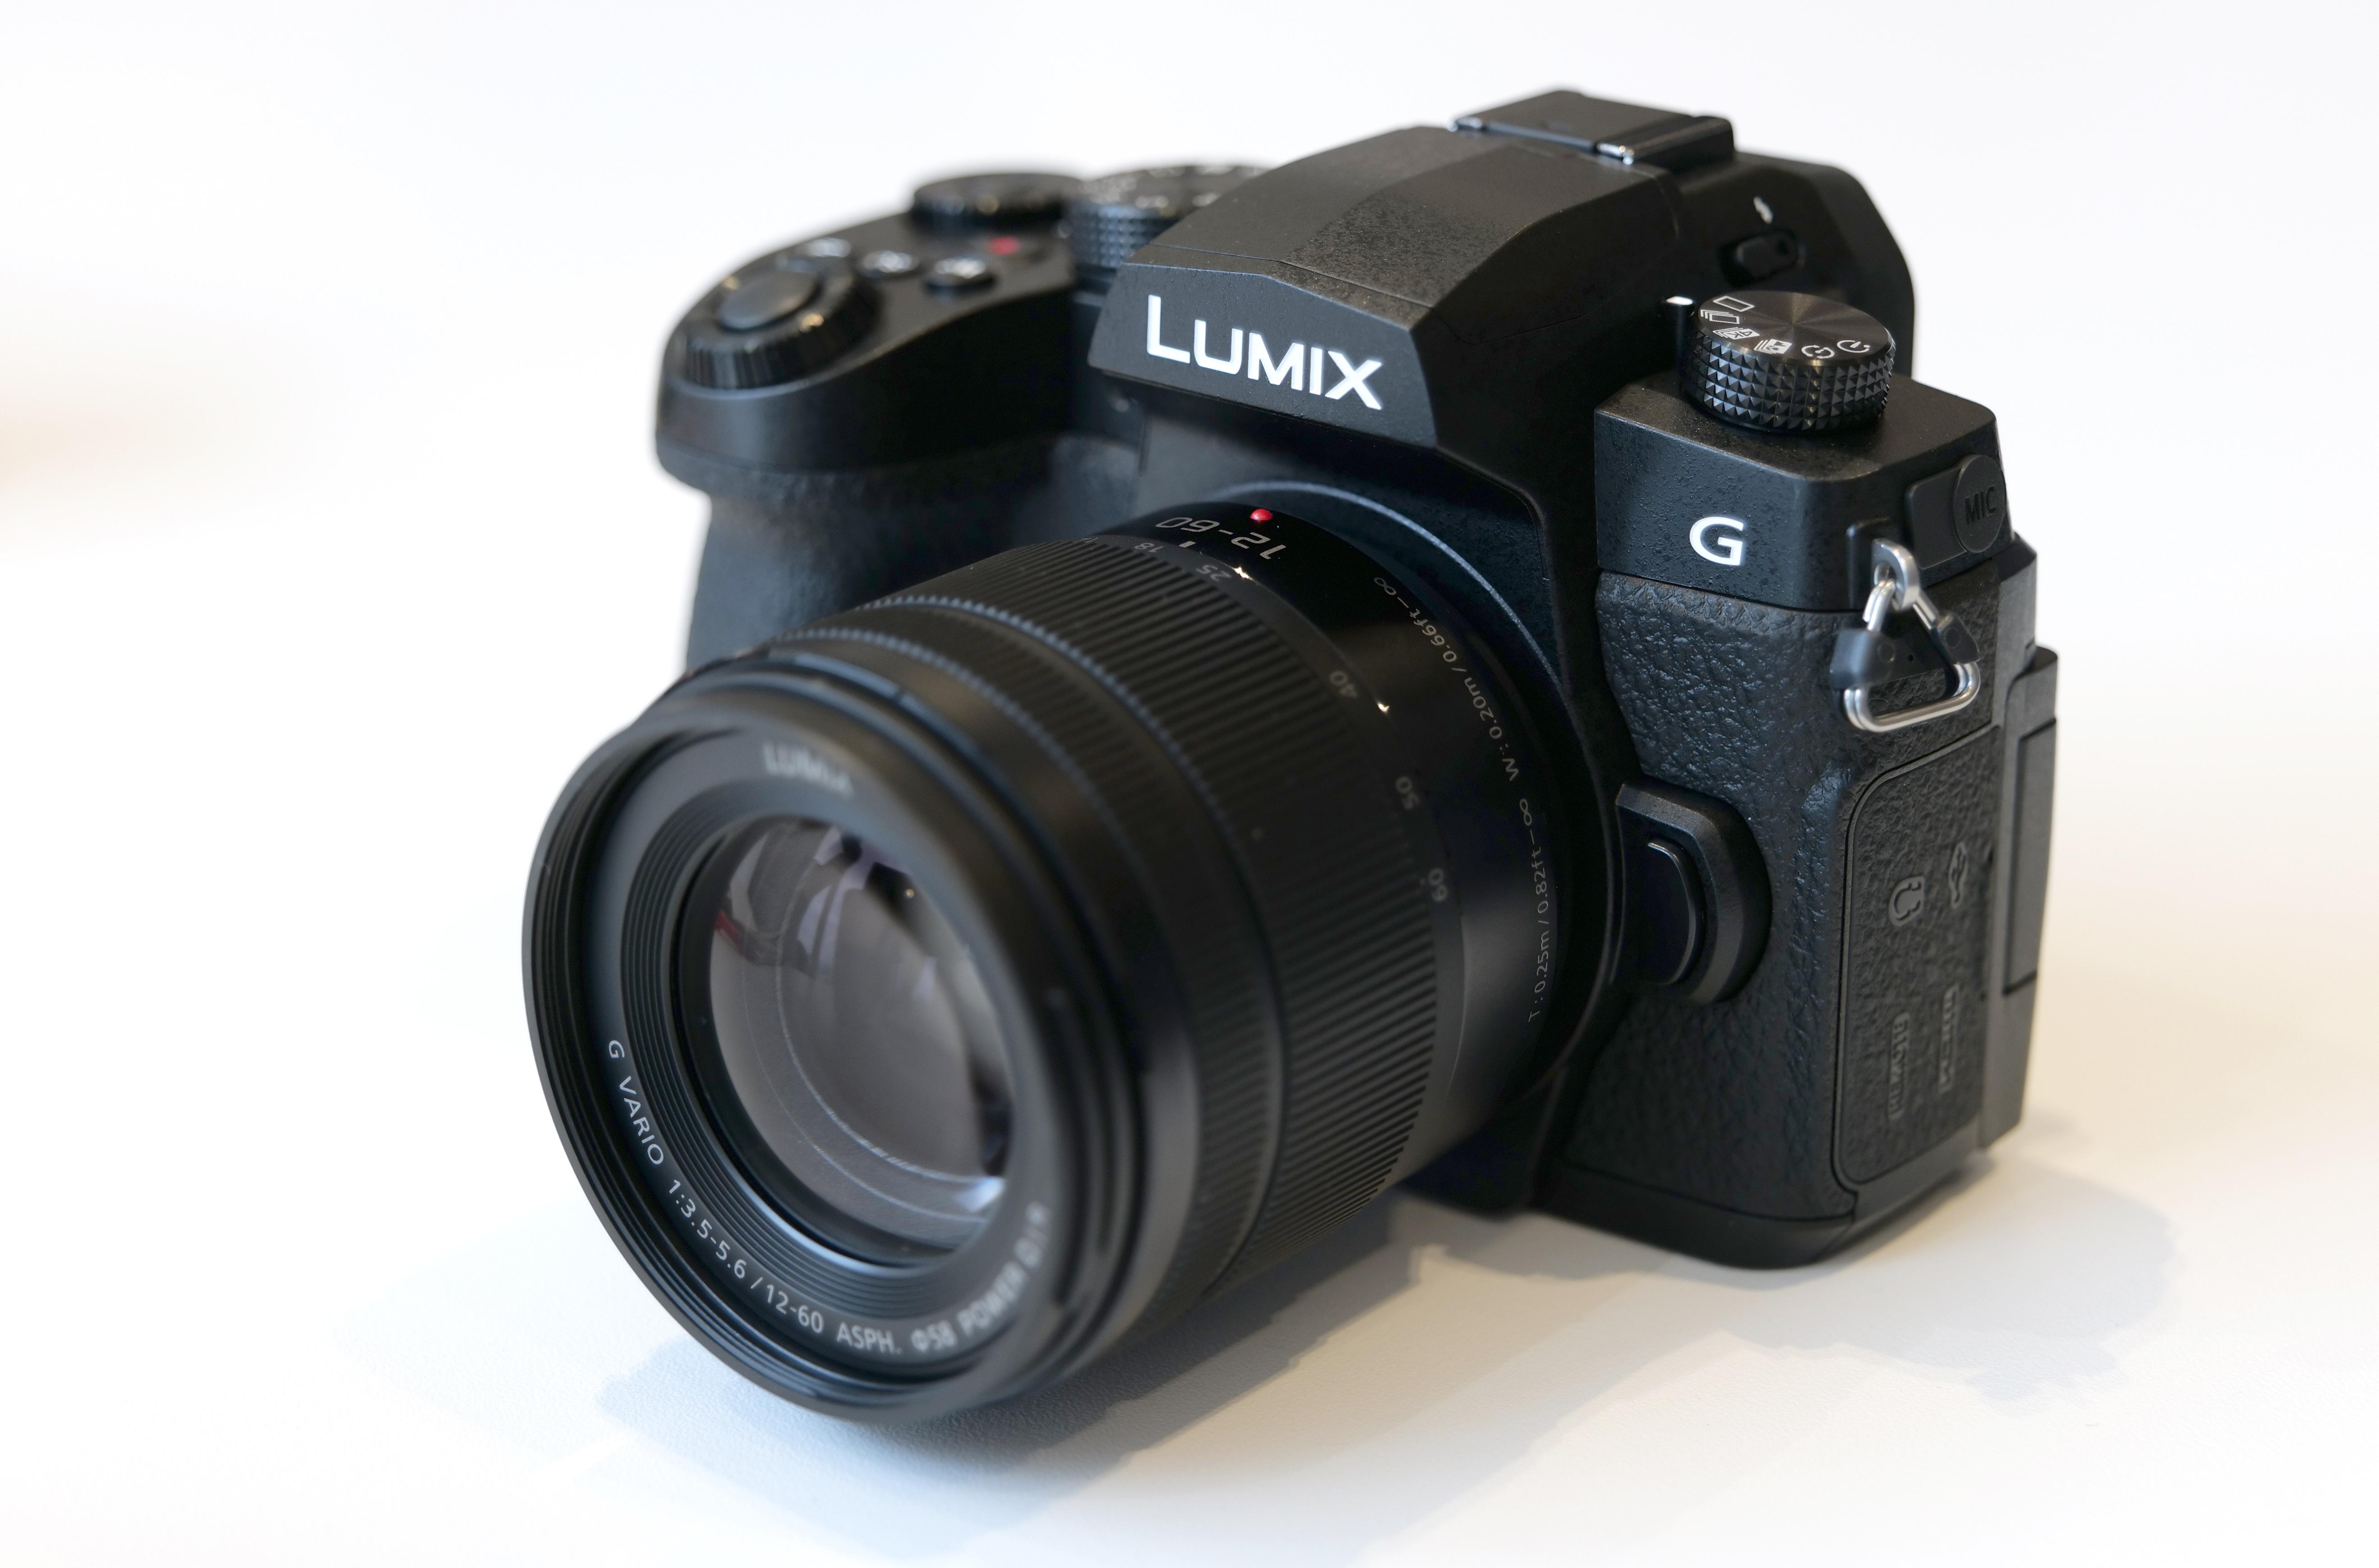 New Firmware Updates For Panasonic Lumix S and G Series